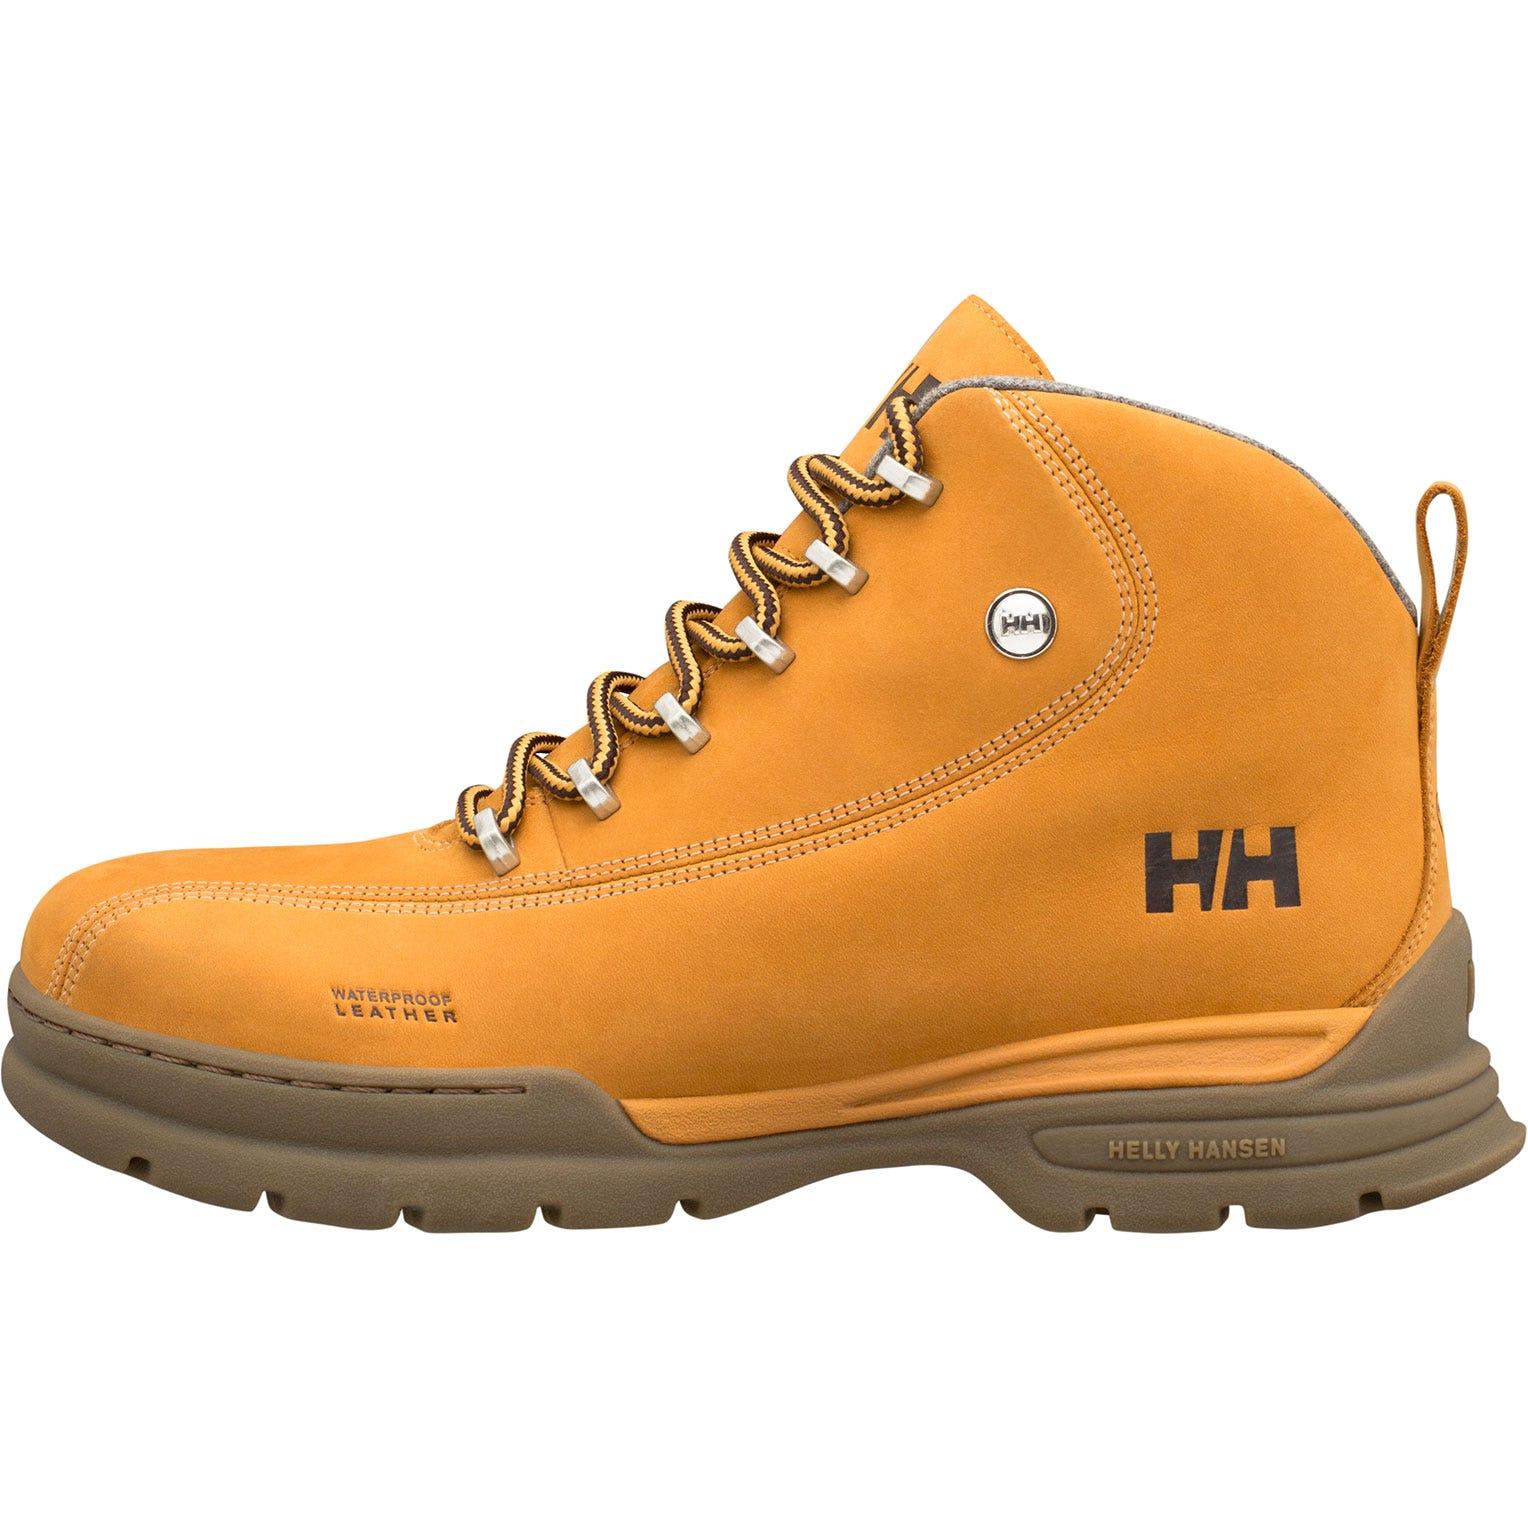 Helly Hansen W Skardi Insulated Womens Winter Boot Brown 42/10